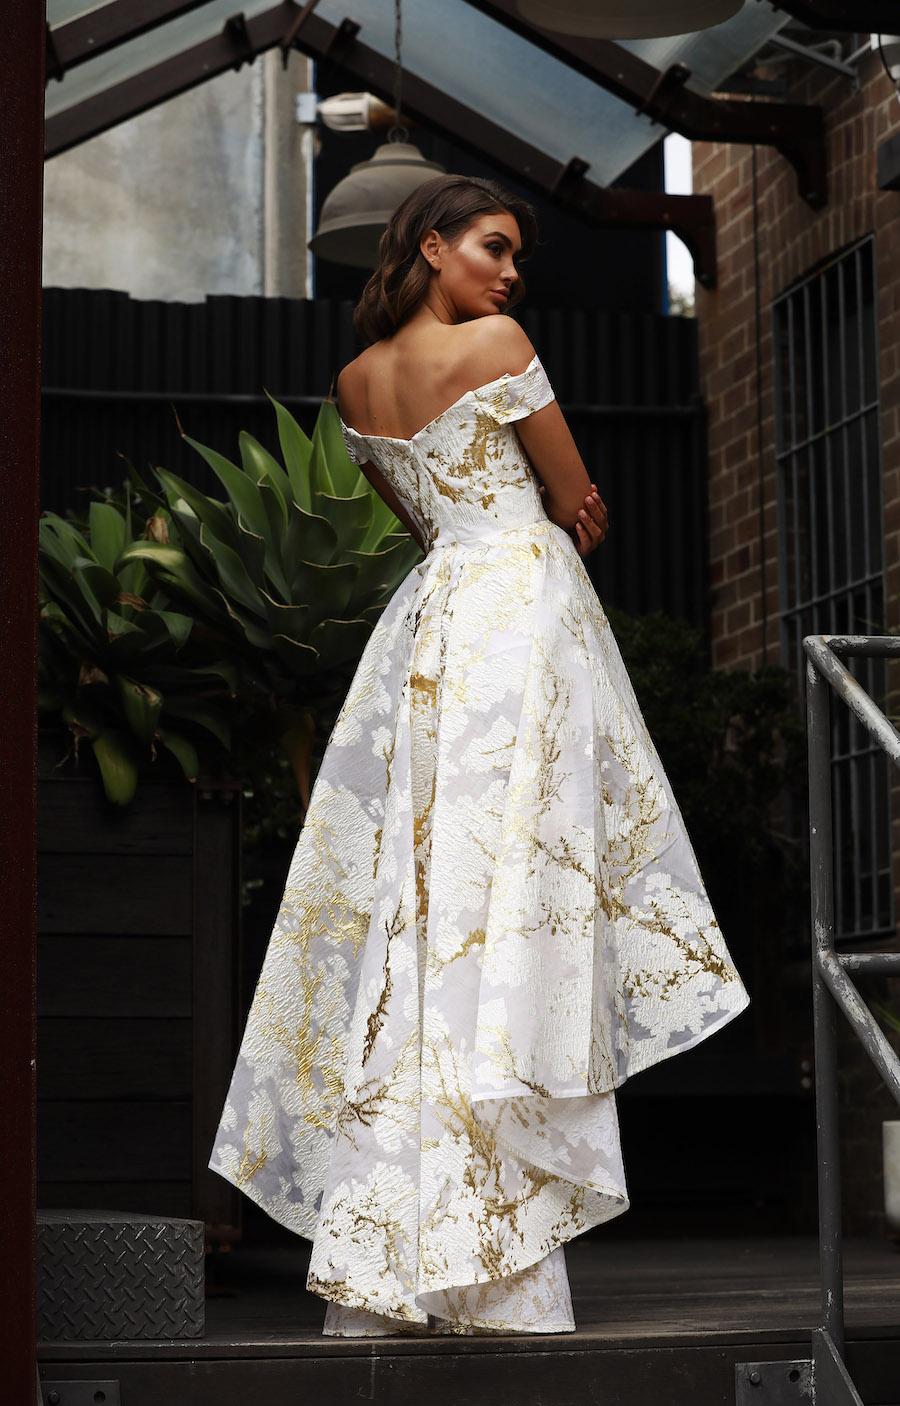 Gorgeous hi-low formal dress with metallic foil detail